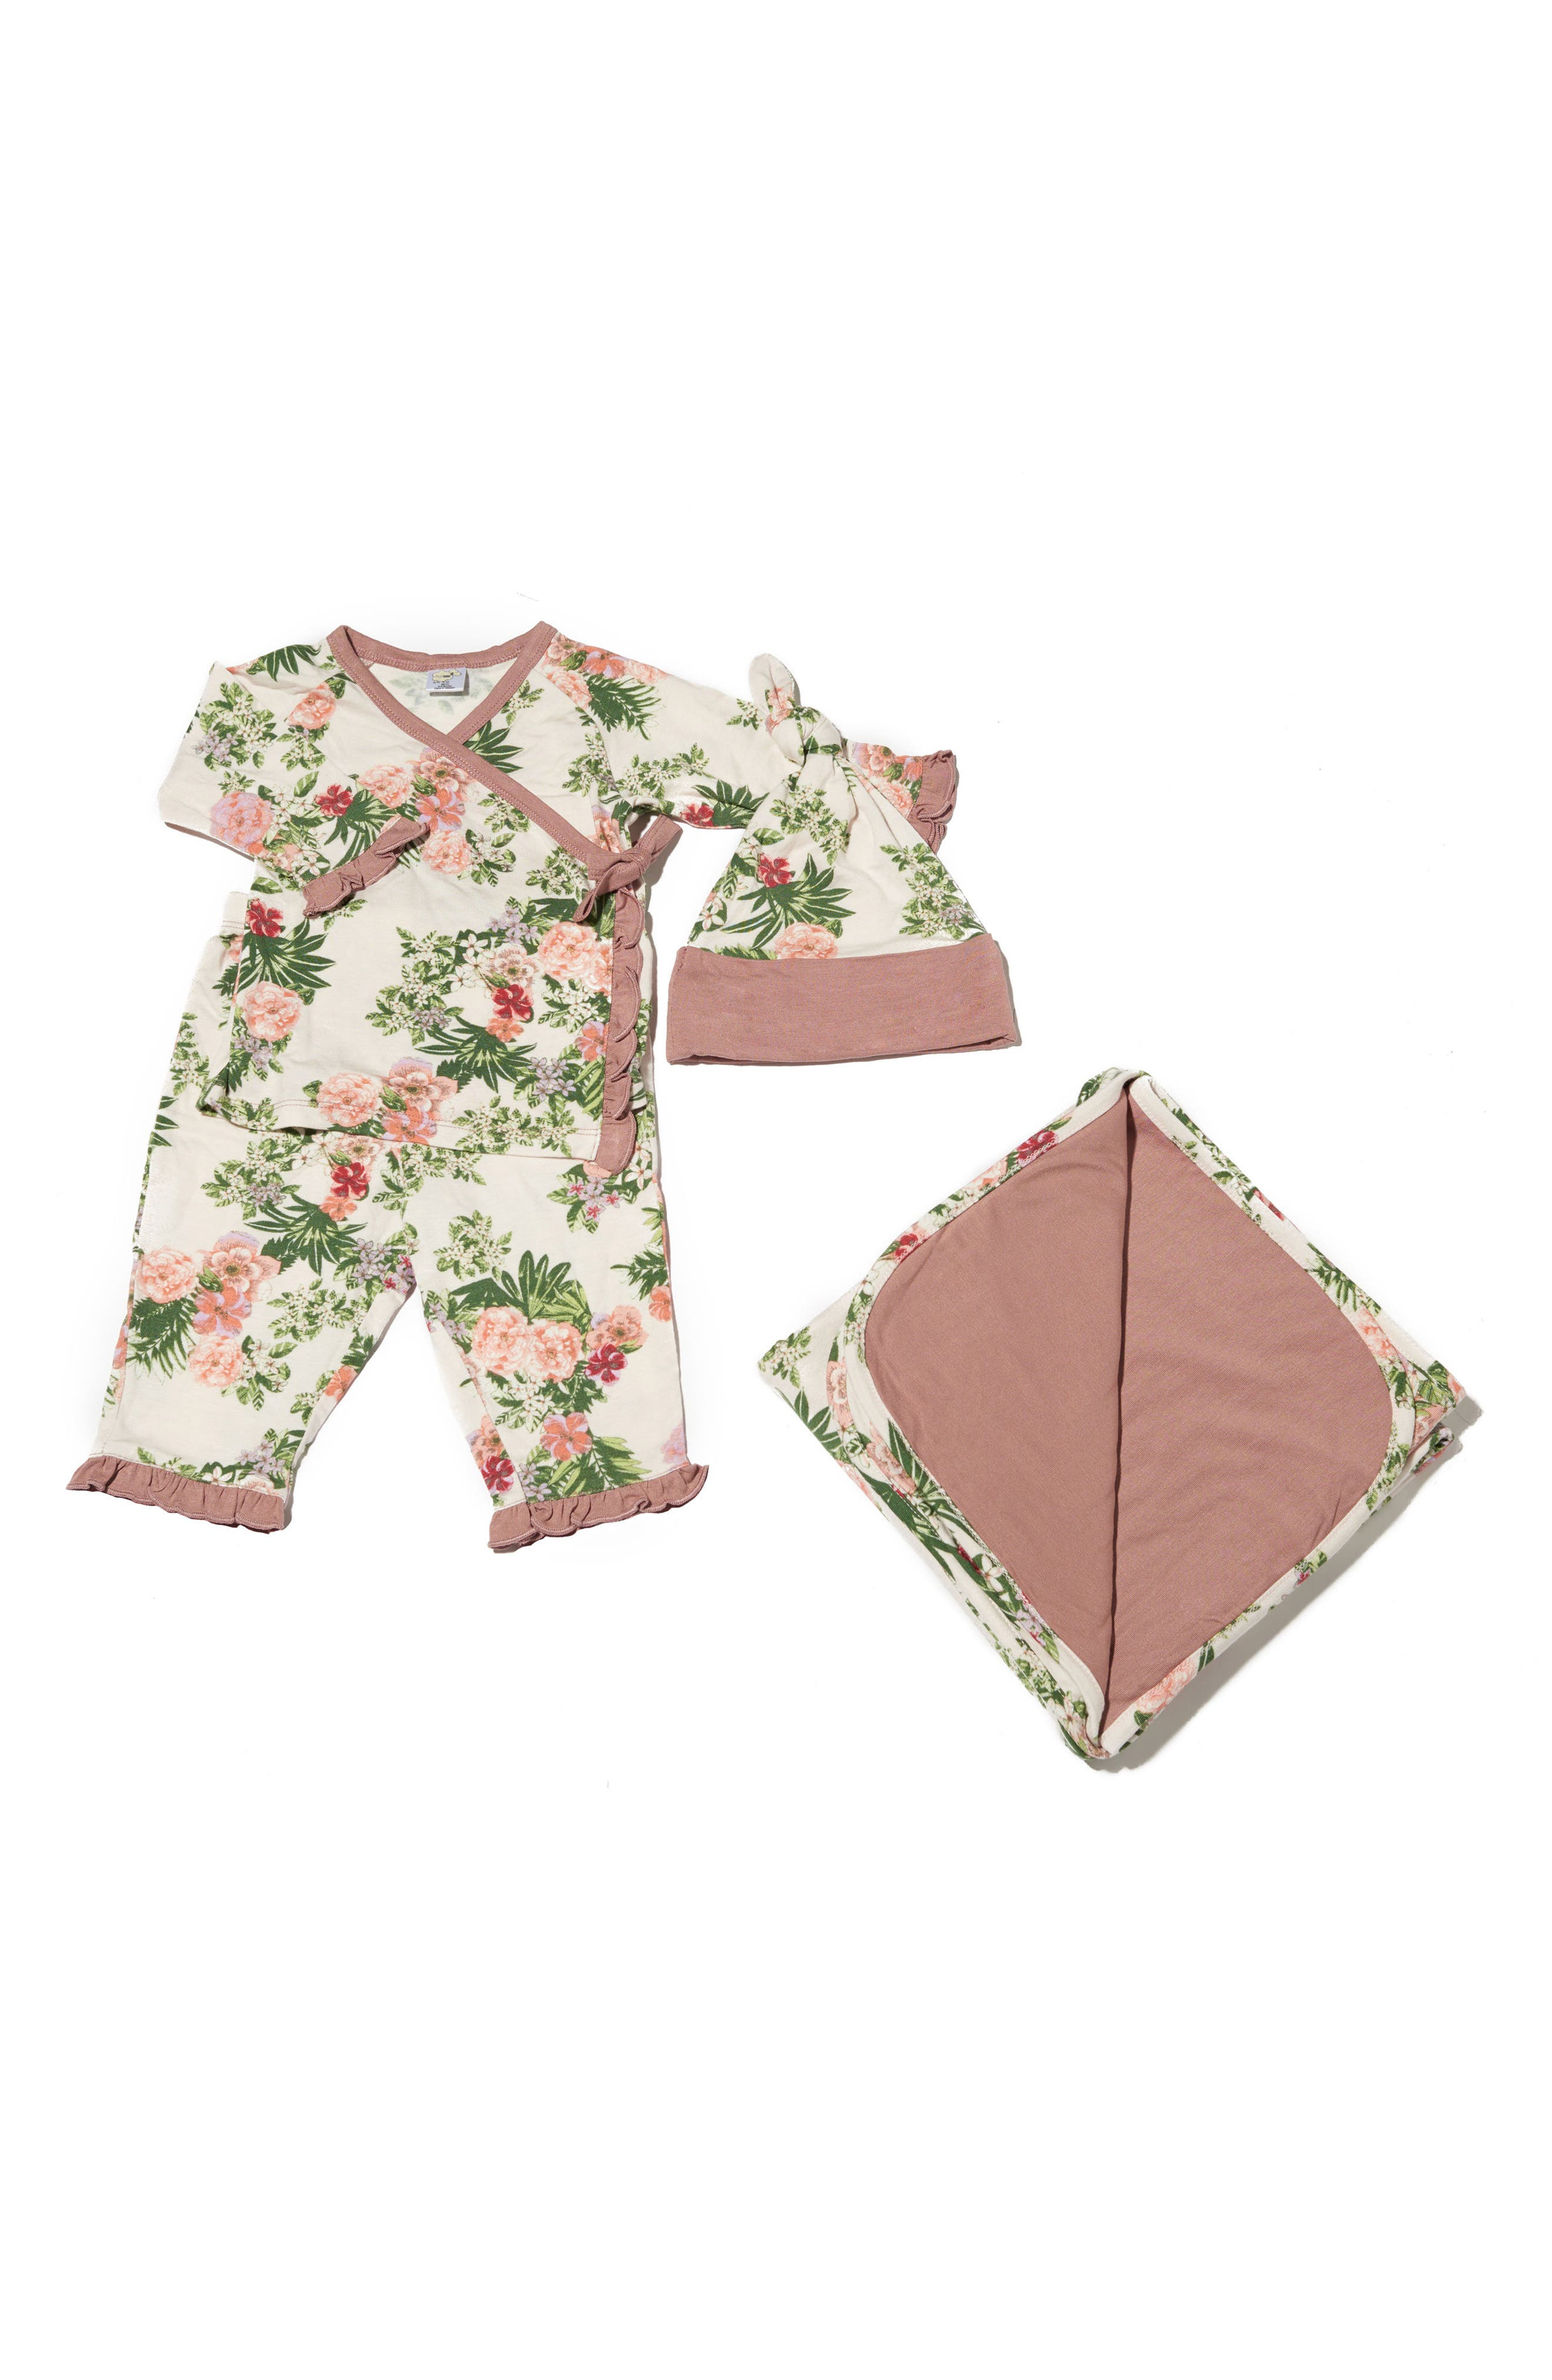 ,                             Ruffle Wrap Top, Pants, Hat & Blanket Set,                             Main thumbnail 1, color,                             250